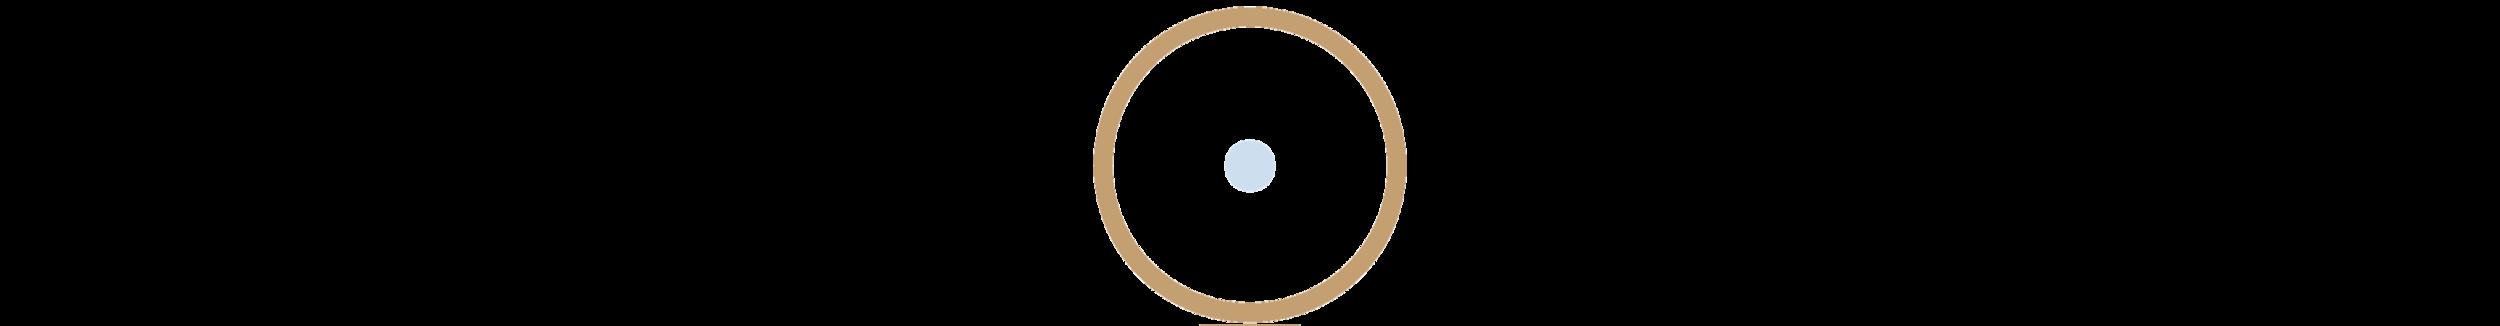 TYR-Circle-2.png